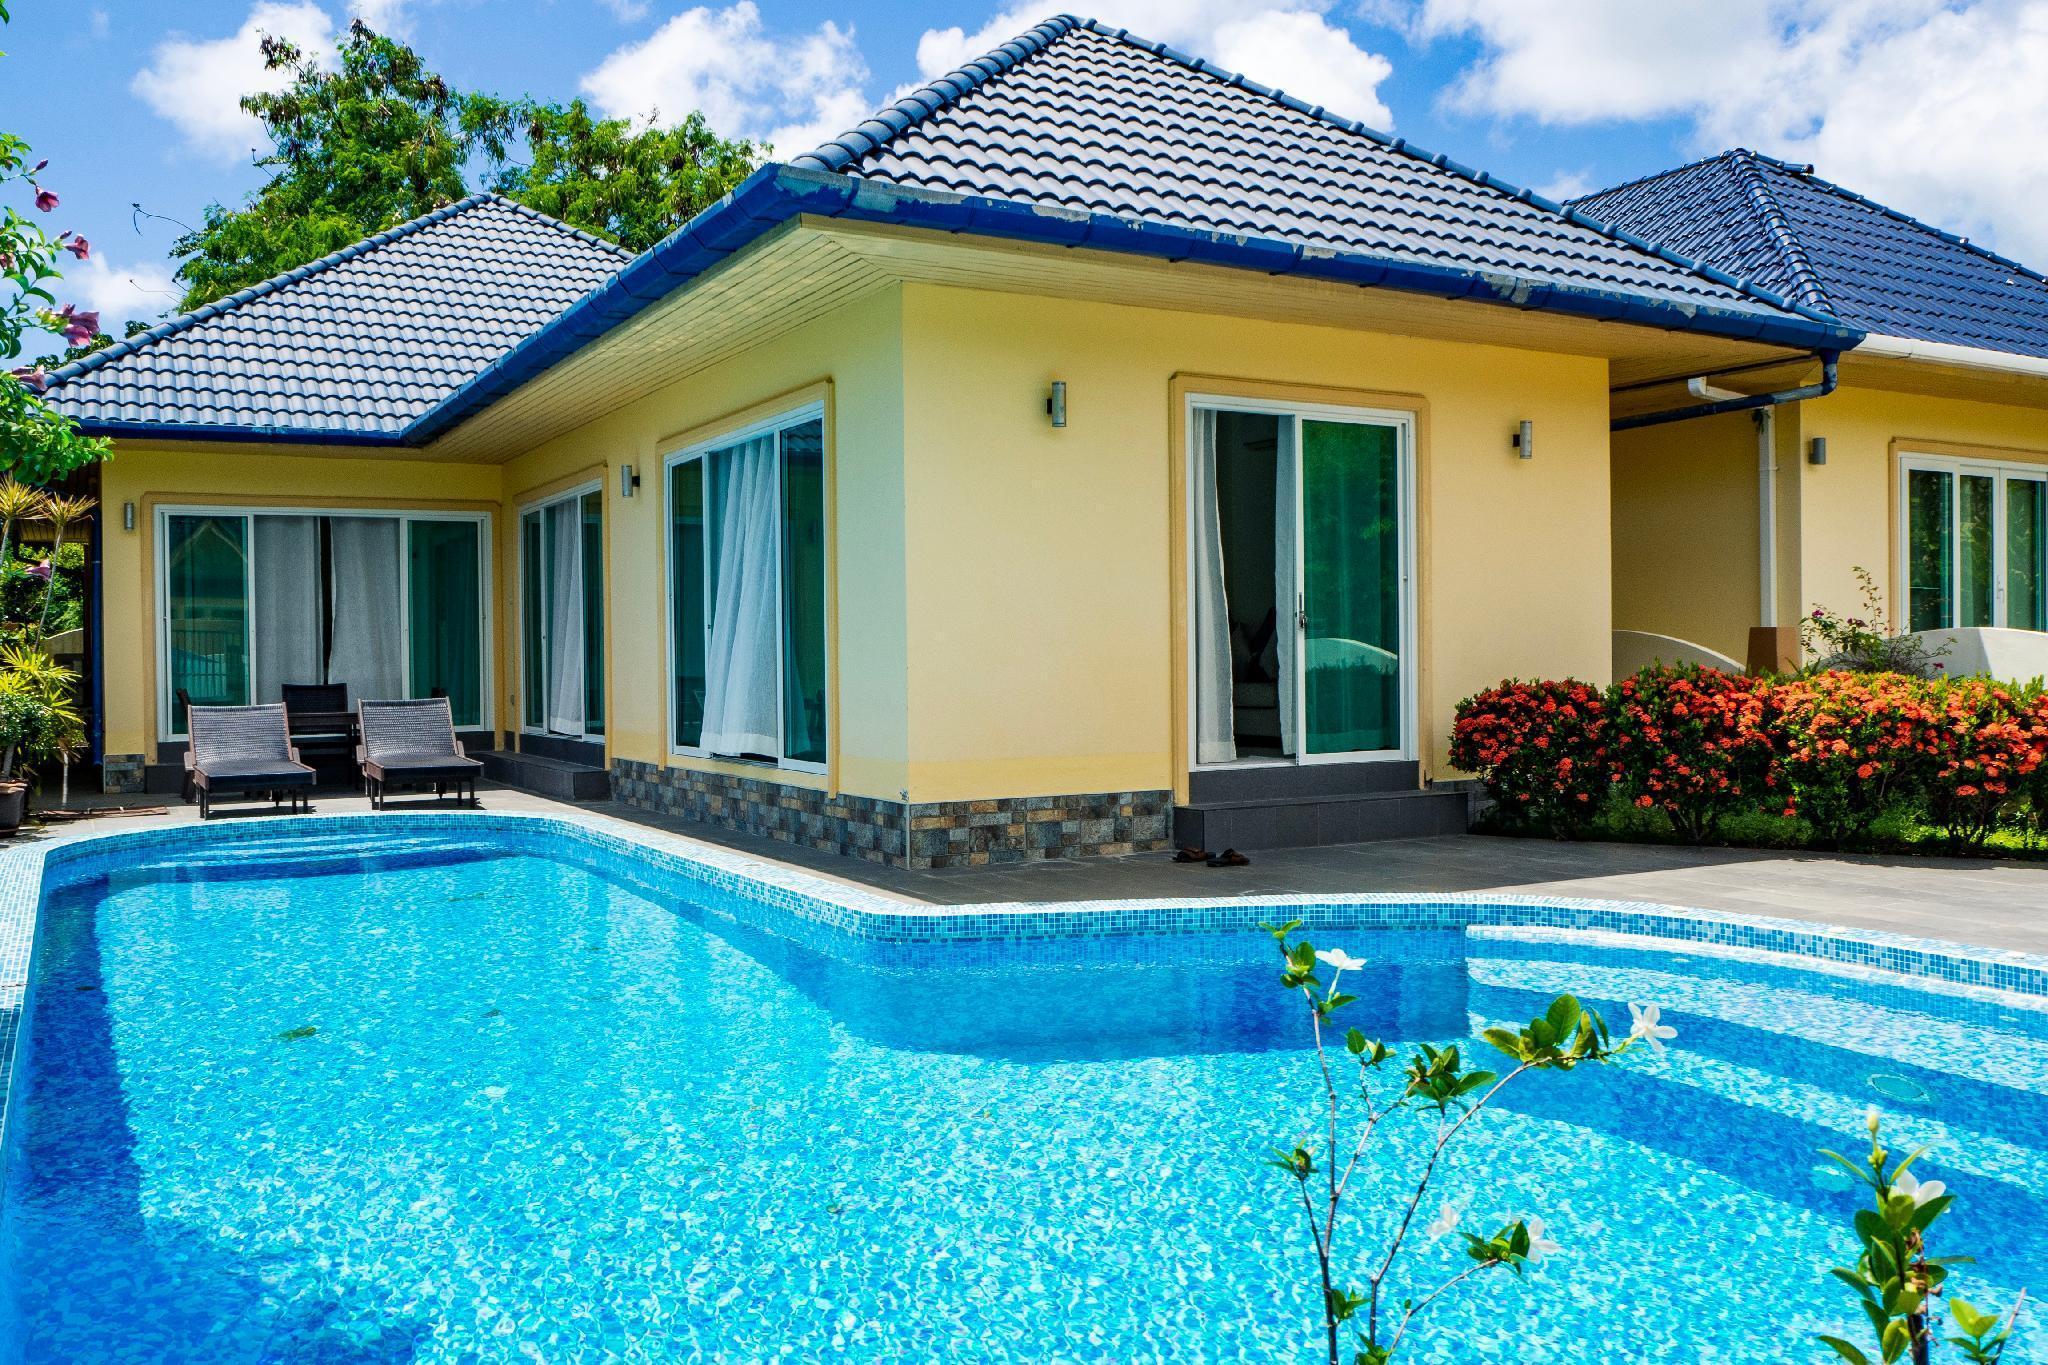 Villa Tanya, 3 Bed with Private Pool & Jacuzzi บ้านเดี่ยว 3 ห้องนอน 3 ห้องน้ำส่วนตัว ขนาด 250 ตร.ม. – หาดราไวย์